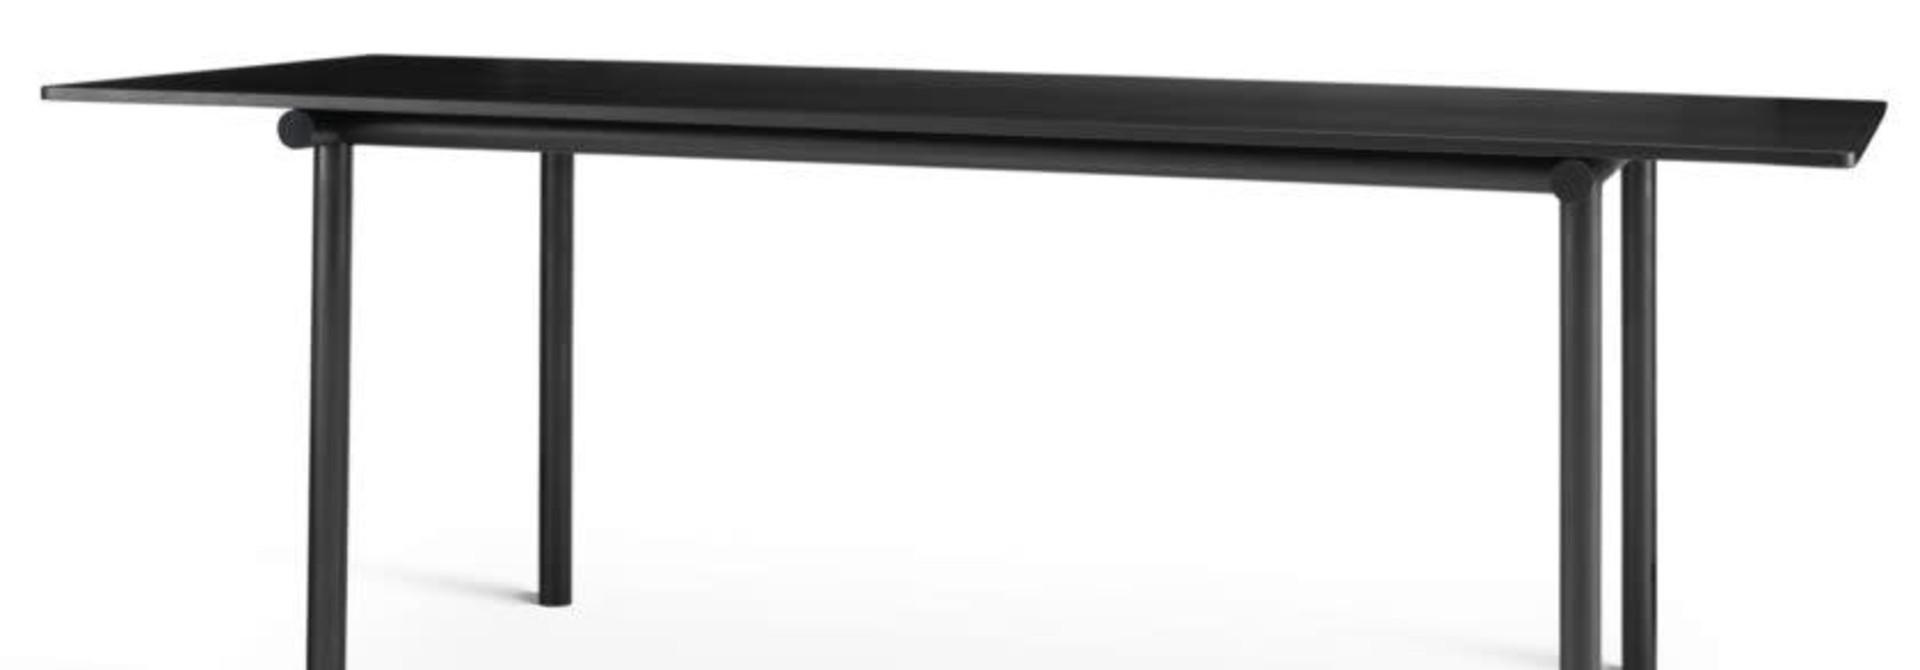 Tubby Tube Table - Black Frame 240 x 90 cm.